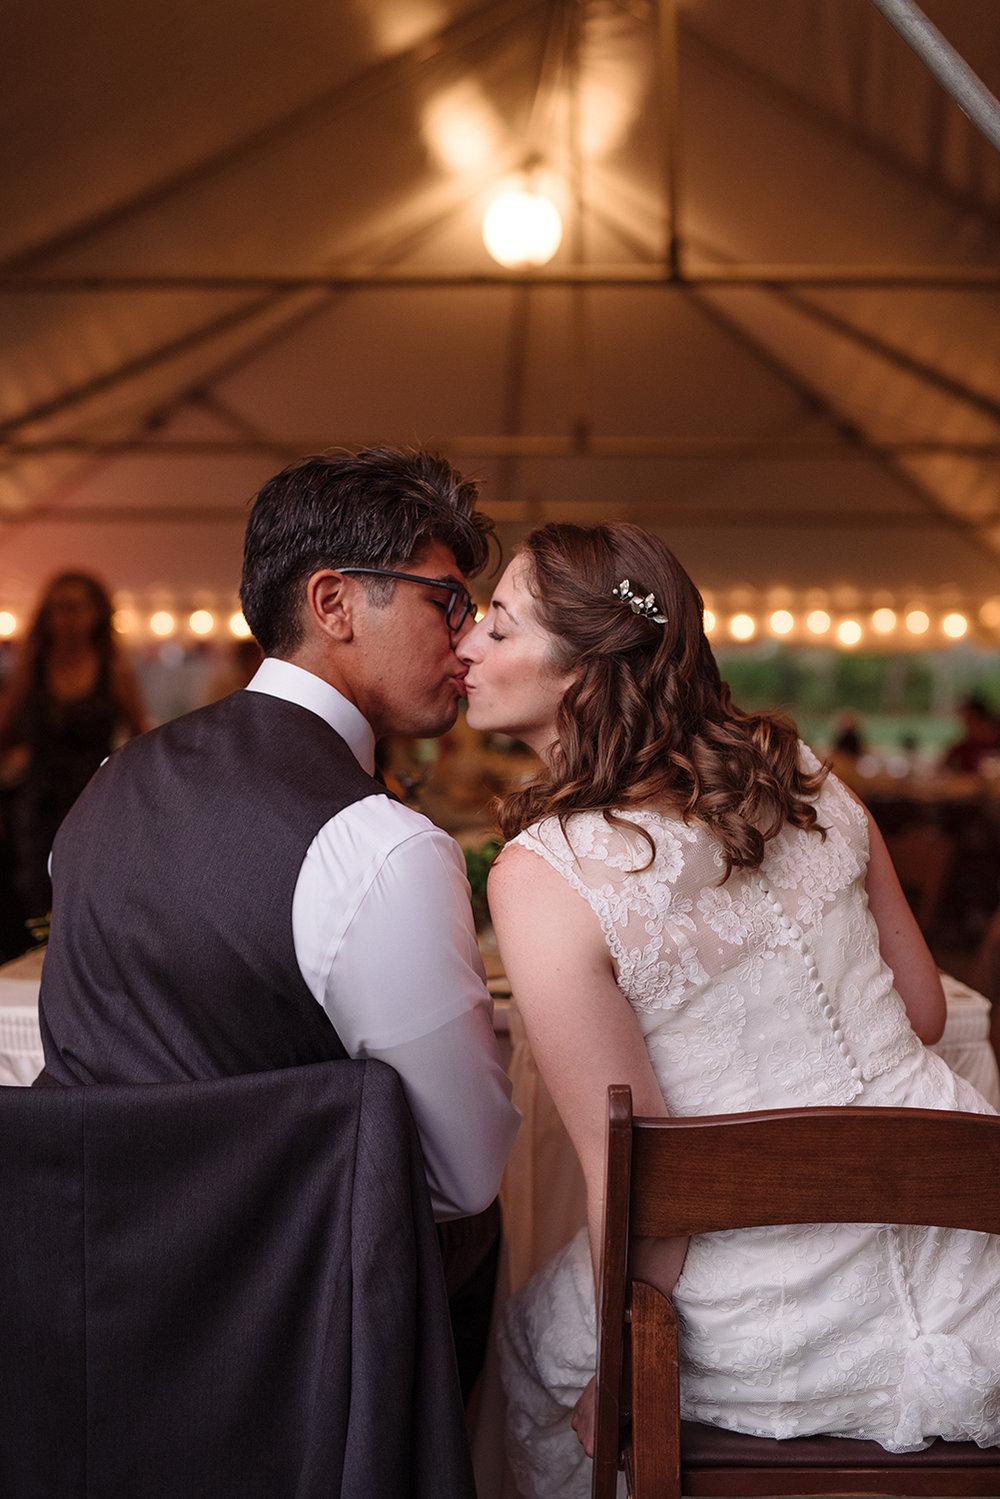 Kaitlyn+Harley- Raritan Inn Wedding- Bride and Groom Kissing Backs of Chairs- Olivia Christina Photo.JPG